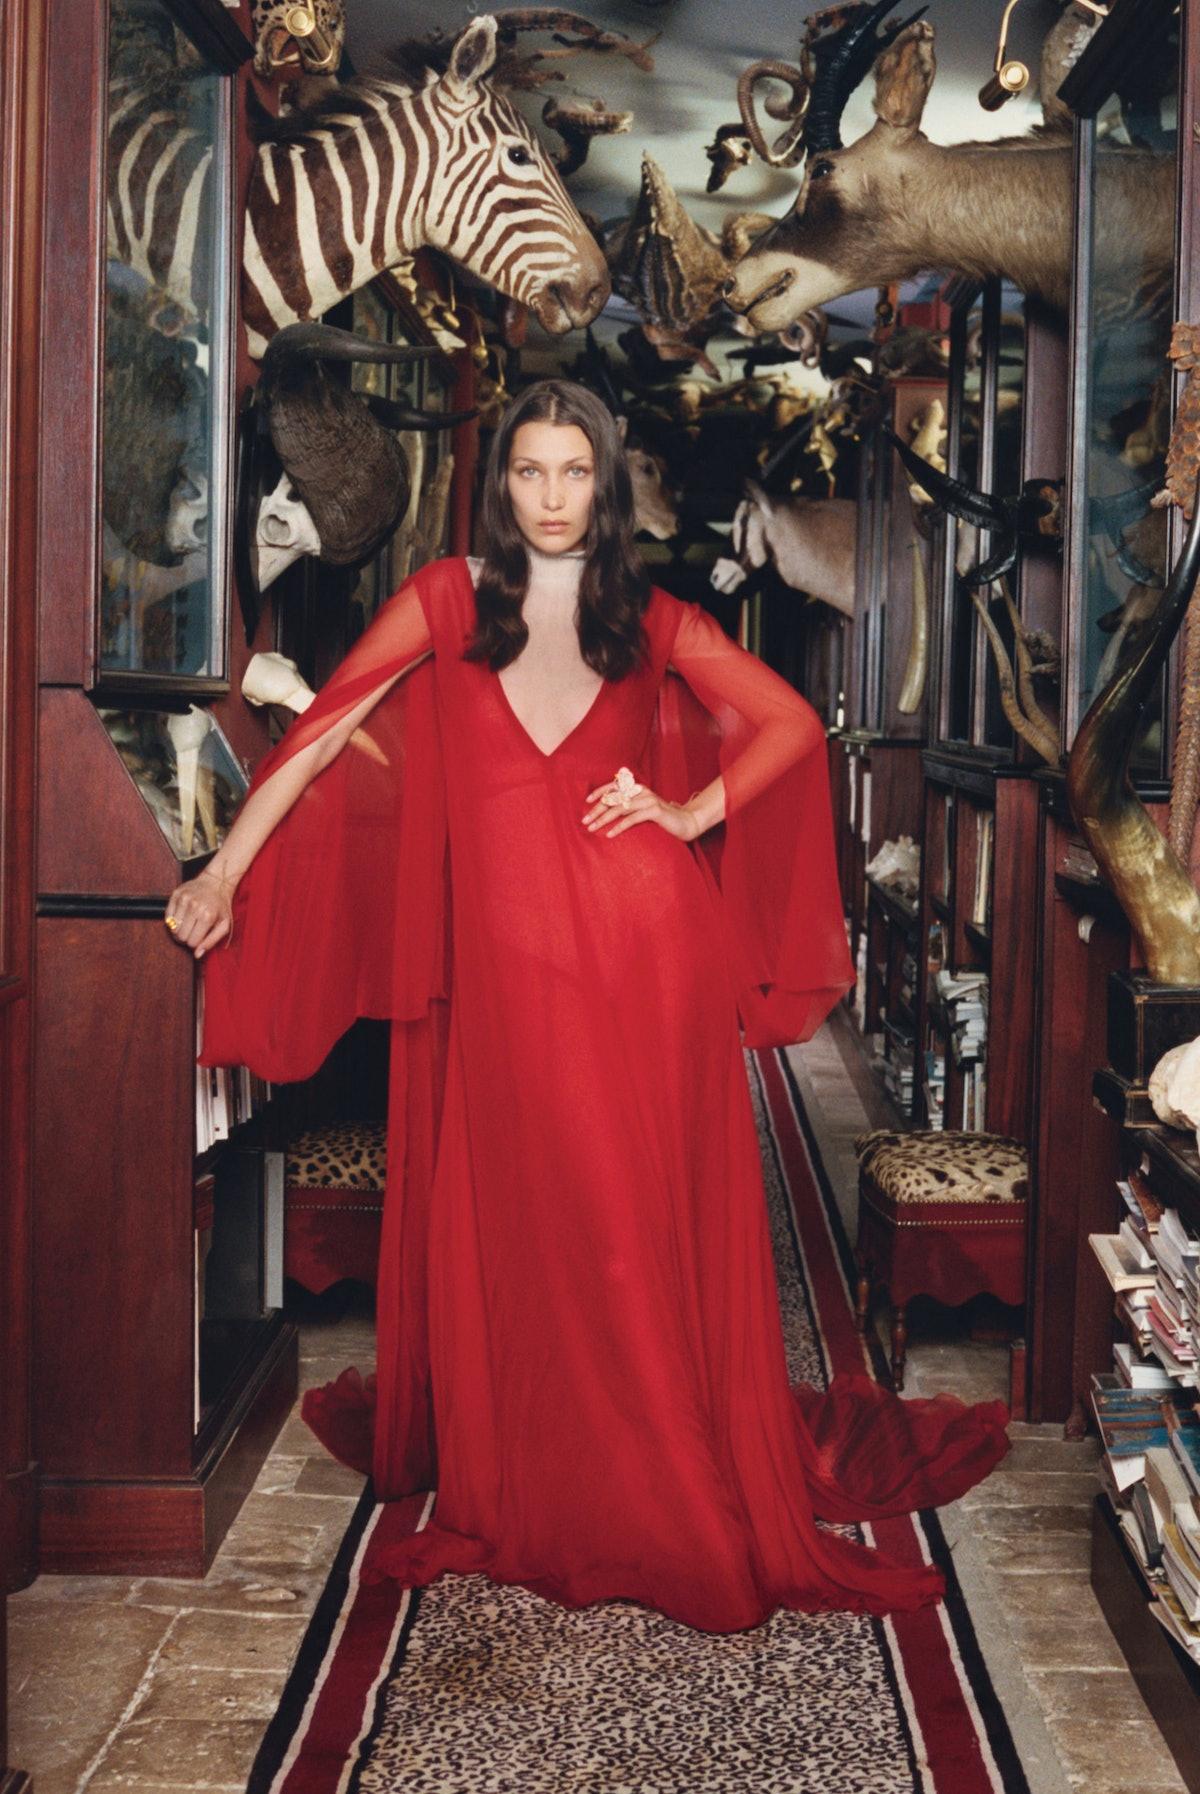 1016.w.VS.couture.image3.jpg